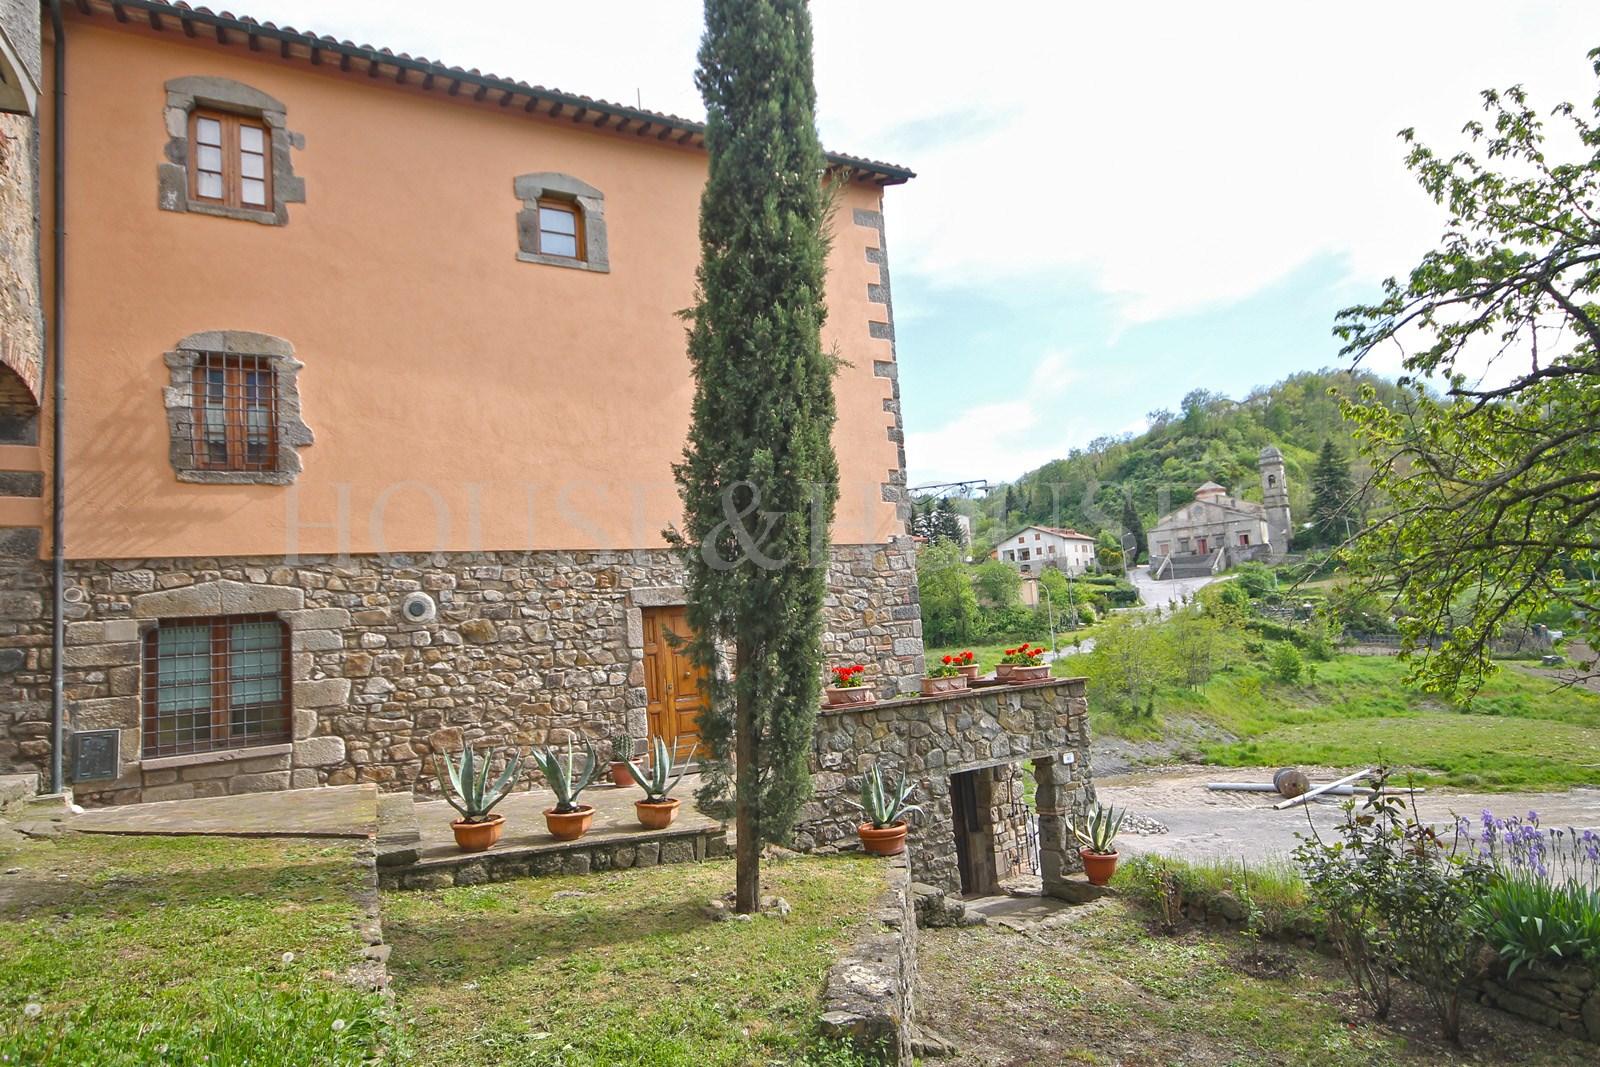 Toscana arcidosso casa in vendita house and houses italia for Toscana house